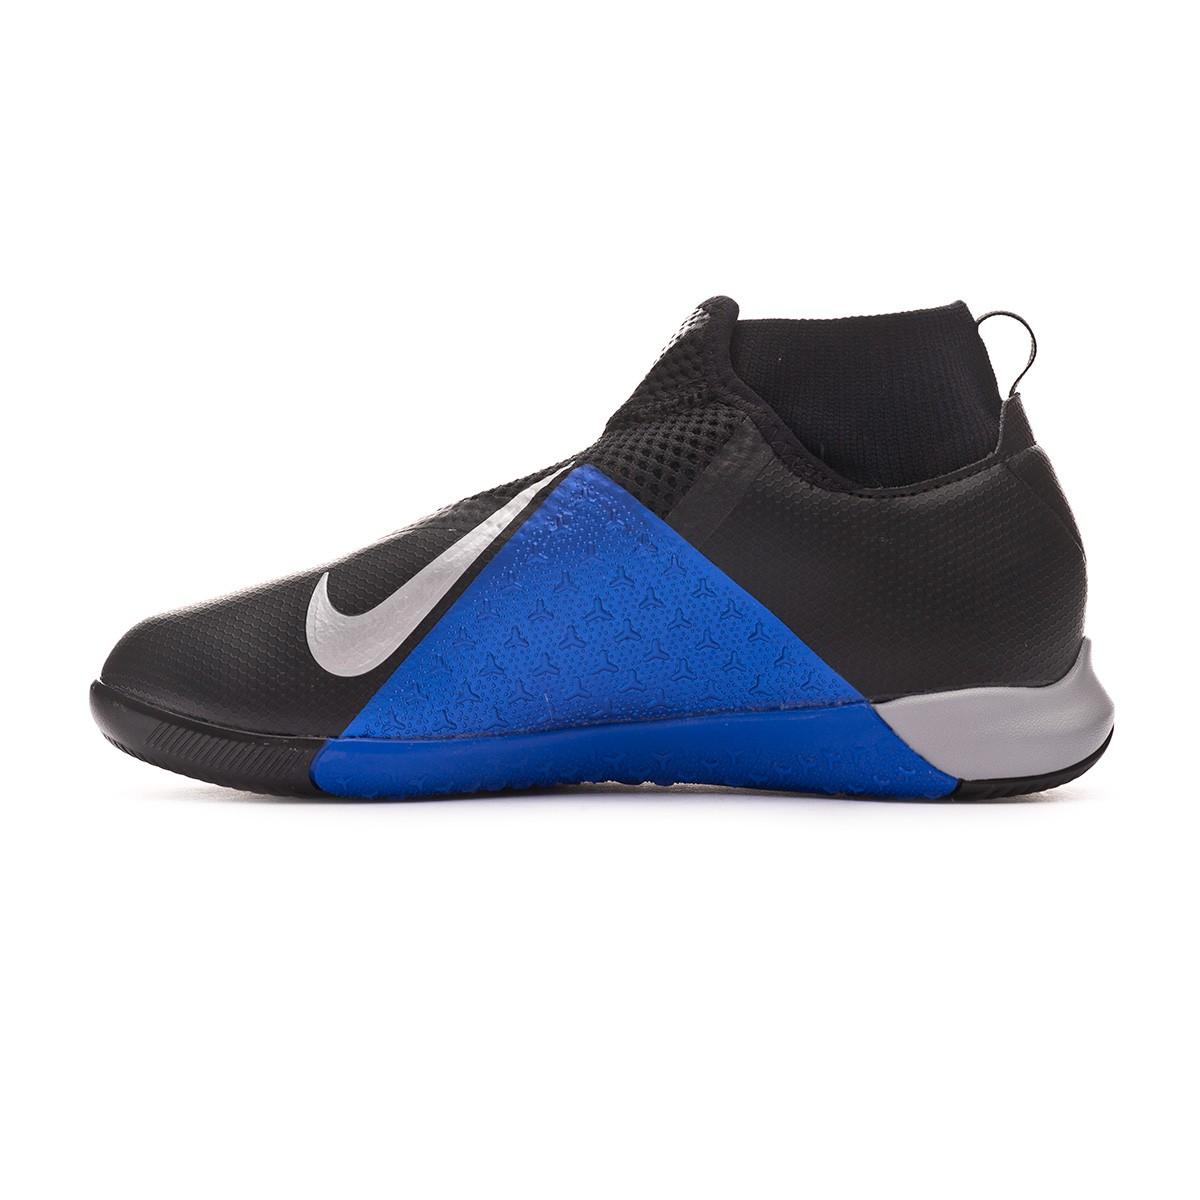 286520a0c58 Futsal Boot Nike Phantom Vision Academy DF IC Niño Black-Metallic  silver-Racer blue - Football store Fútbol Emotion